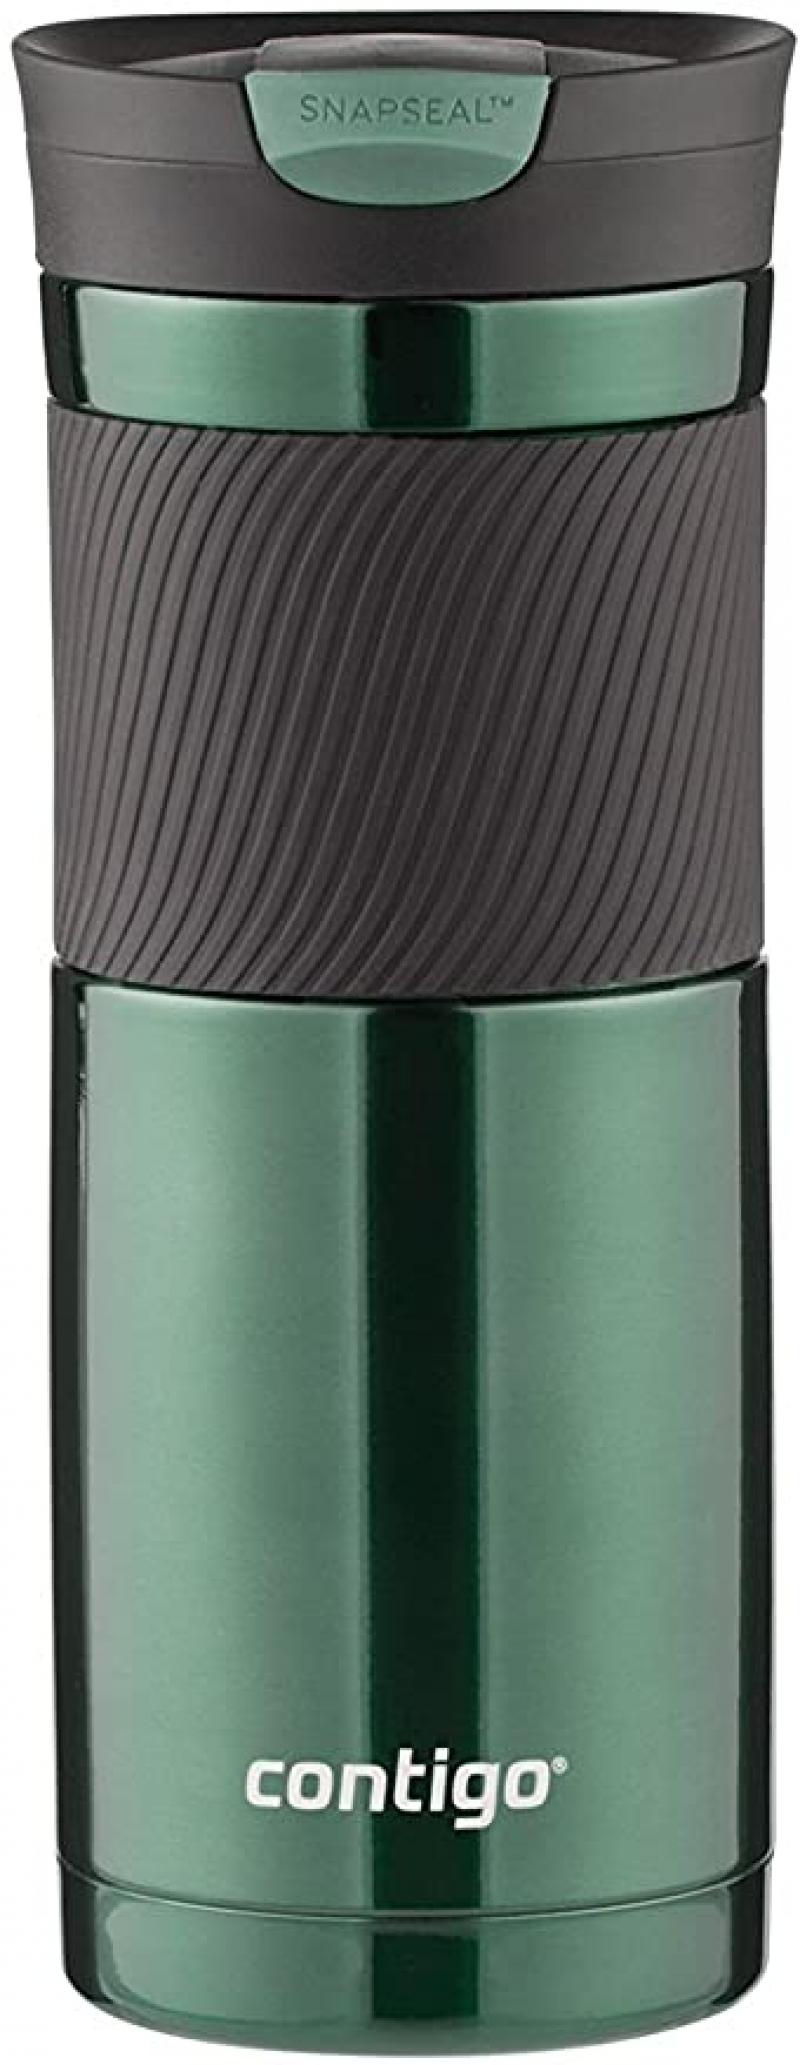 ihocon: Contigo Snapseal Byron Vacuum-Insulated Stainless Steel Travel Mug, 20 Oz., 不銹鋼保温杯